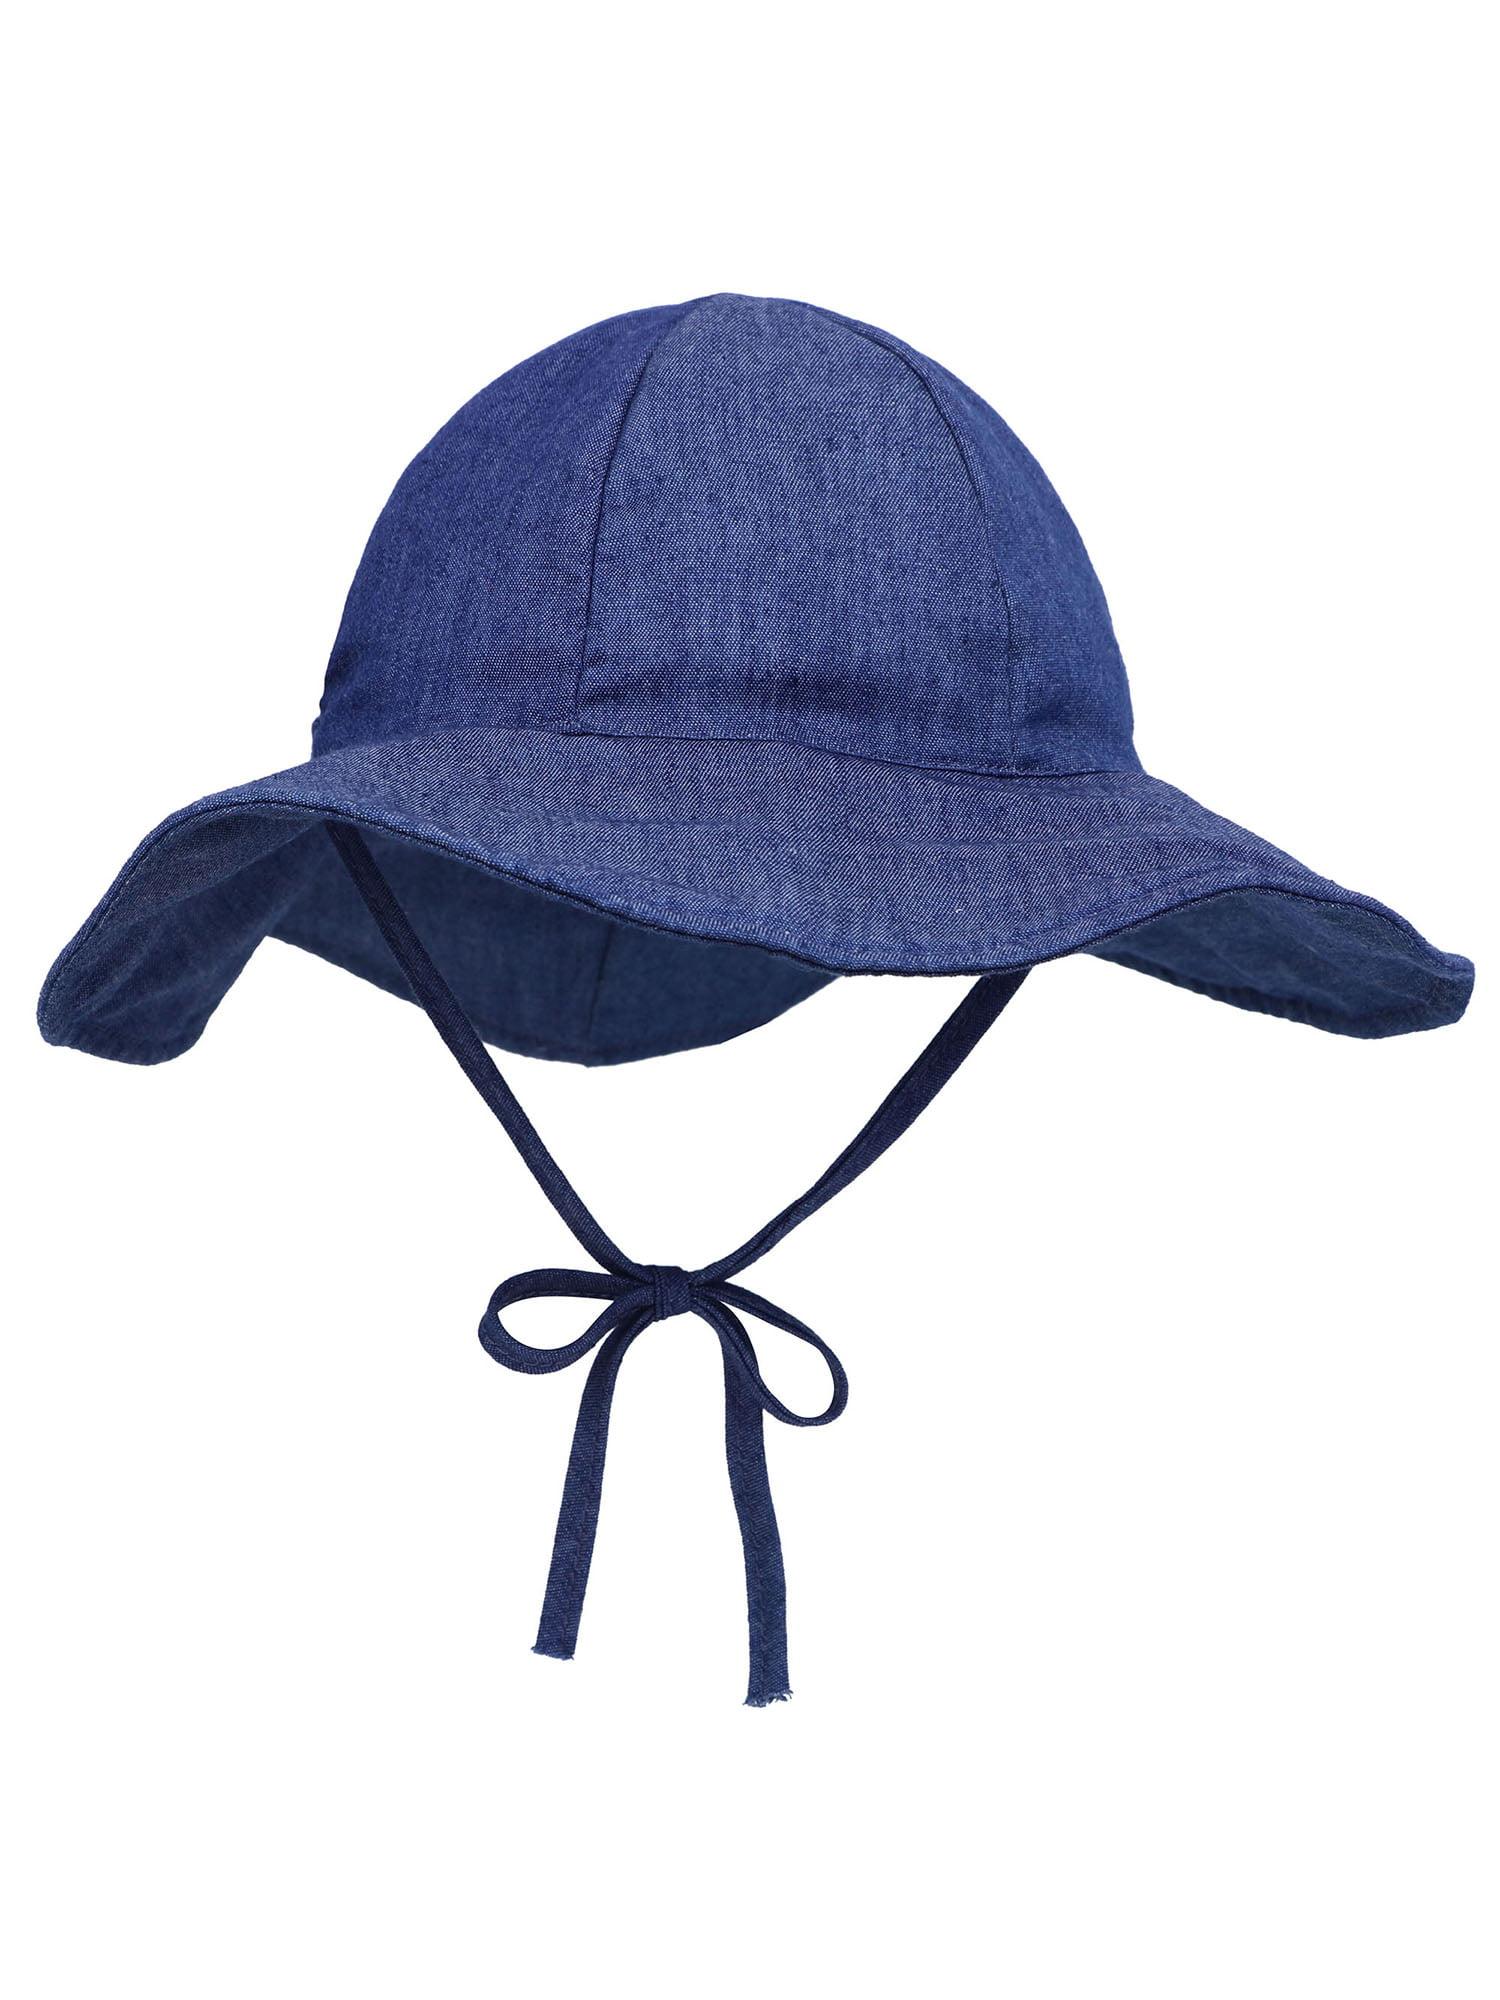 ReversibleLarge Cotton Bucket Sun Hat Blue//Red,12-24 Months Baby Boys SPF 50